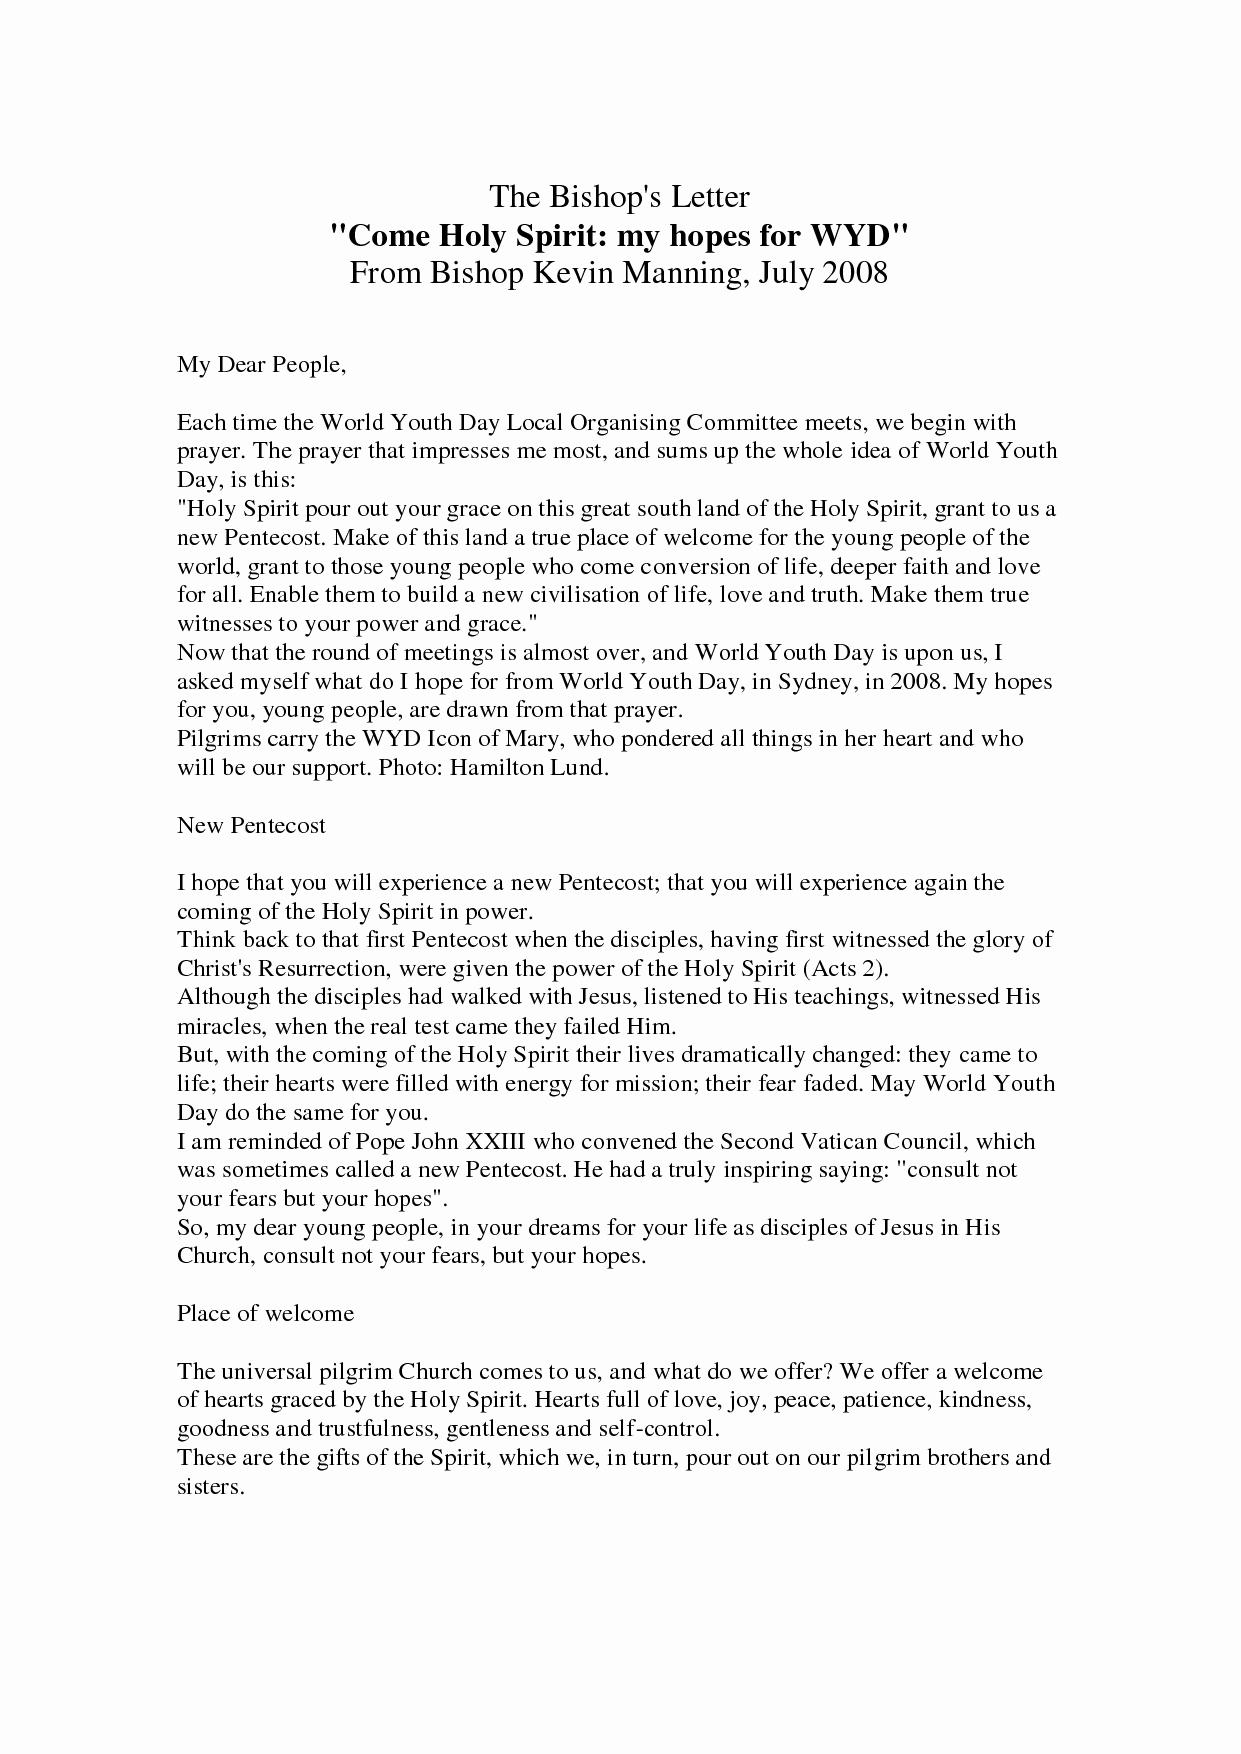 Kairos Letter Samples Fresh Best S Of Catholic Palanca Letters Sample Retreat